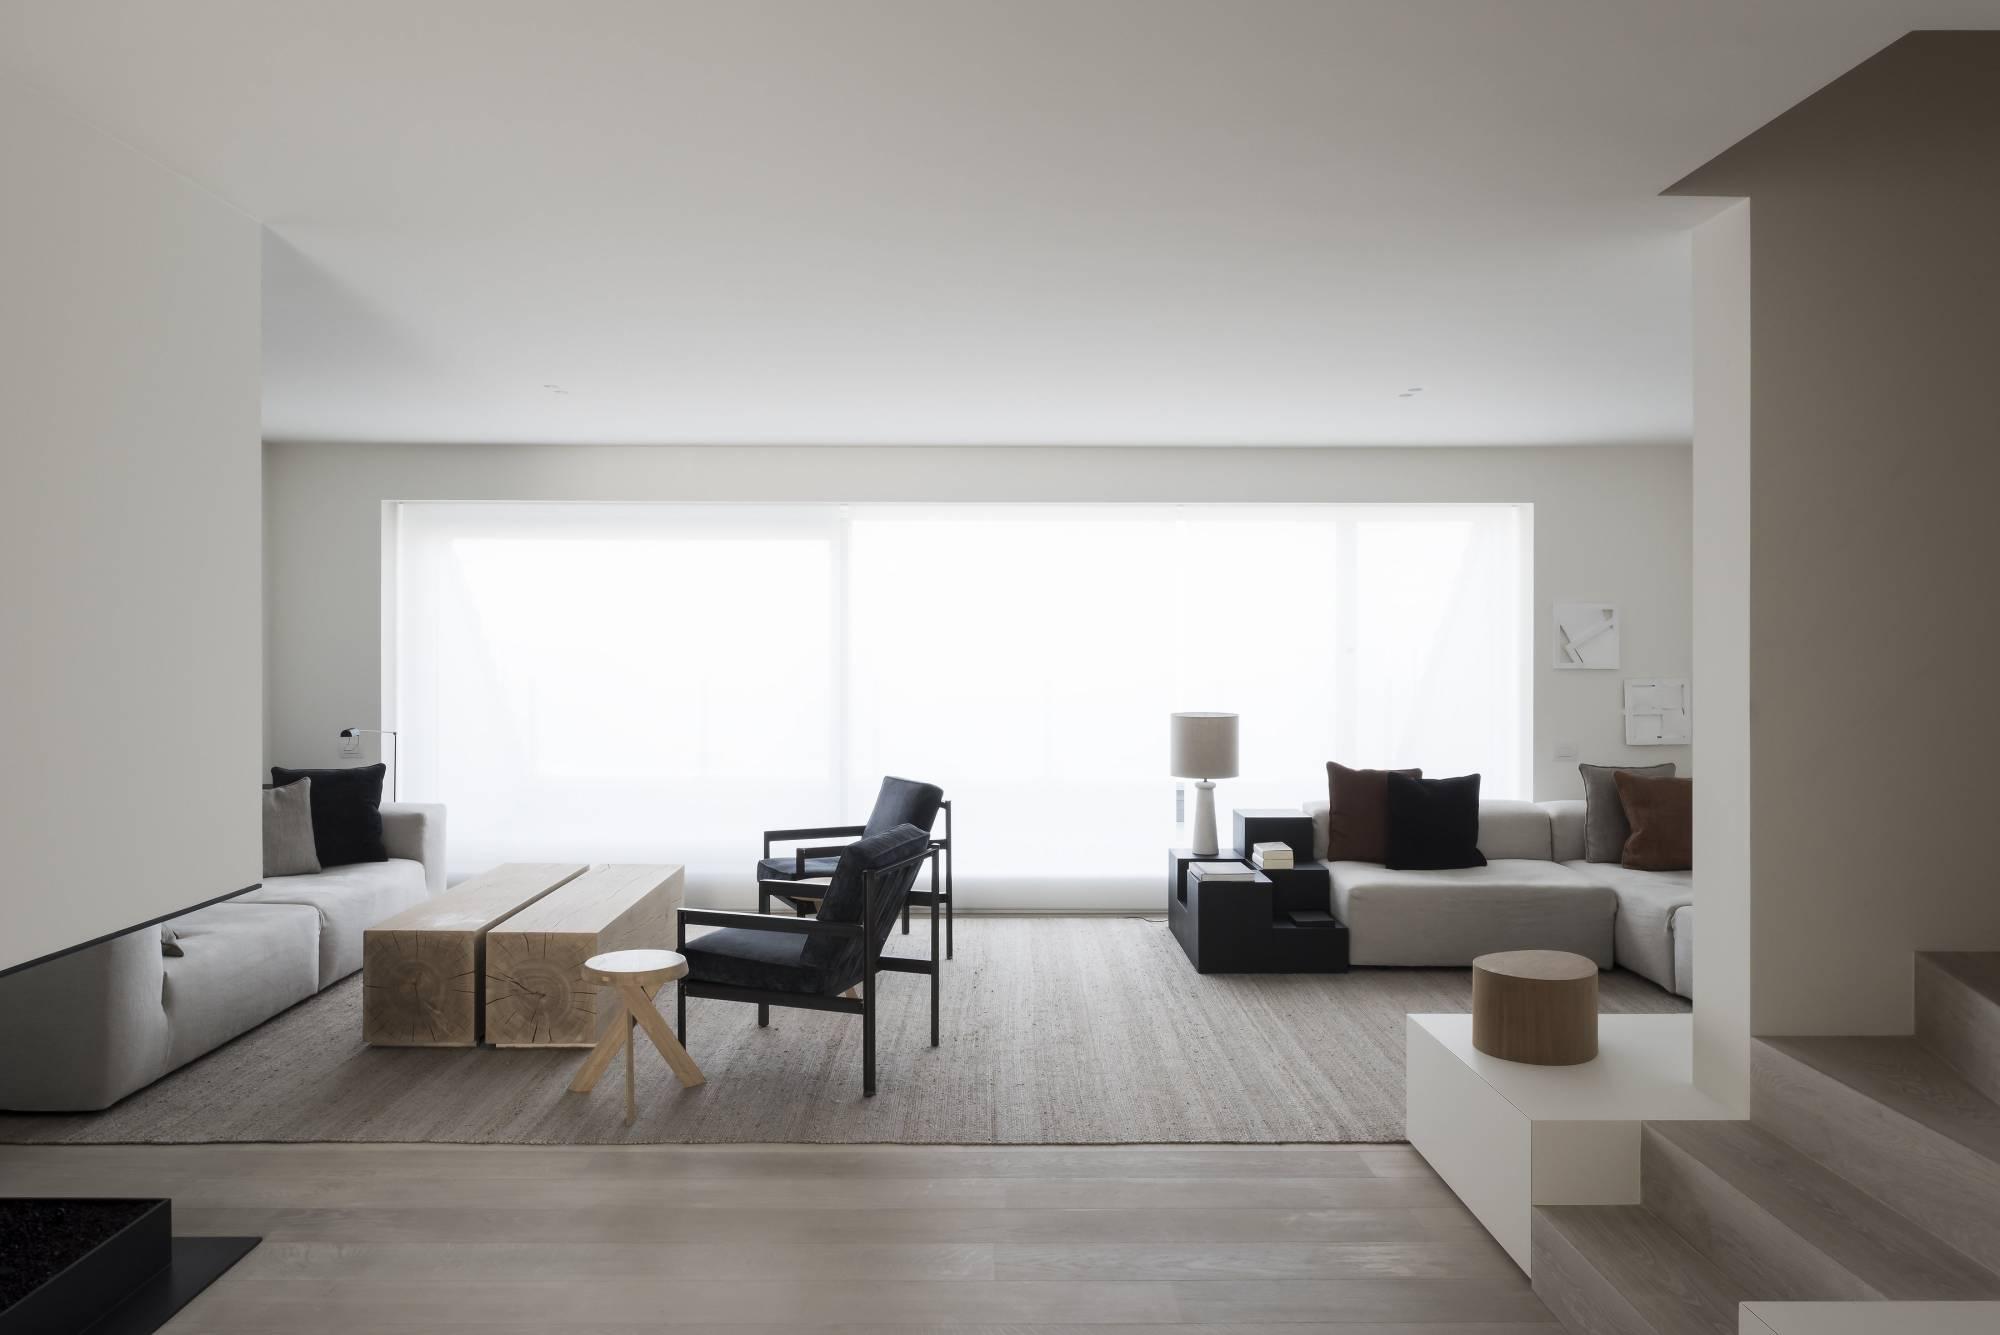 vincent van duysen drd apartment in knokke belgium. Black Bedroom Furniture Sets. Home Design Ideas